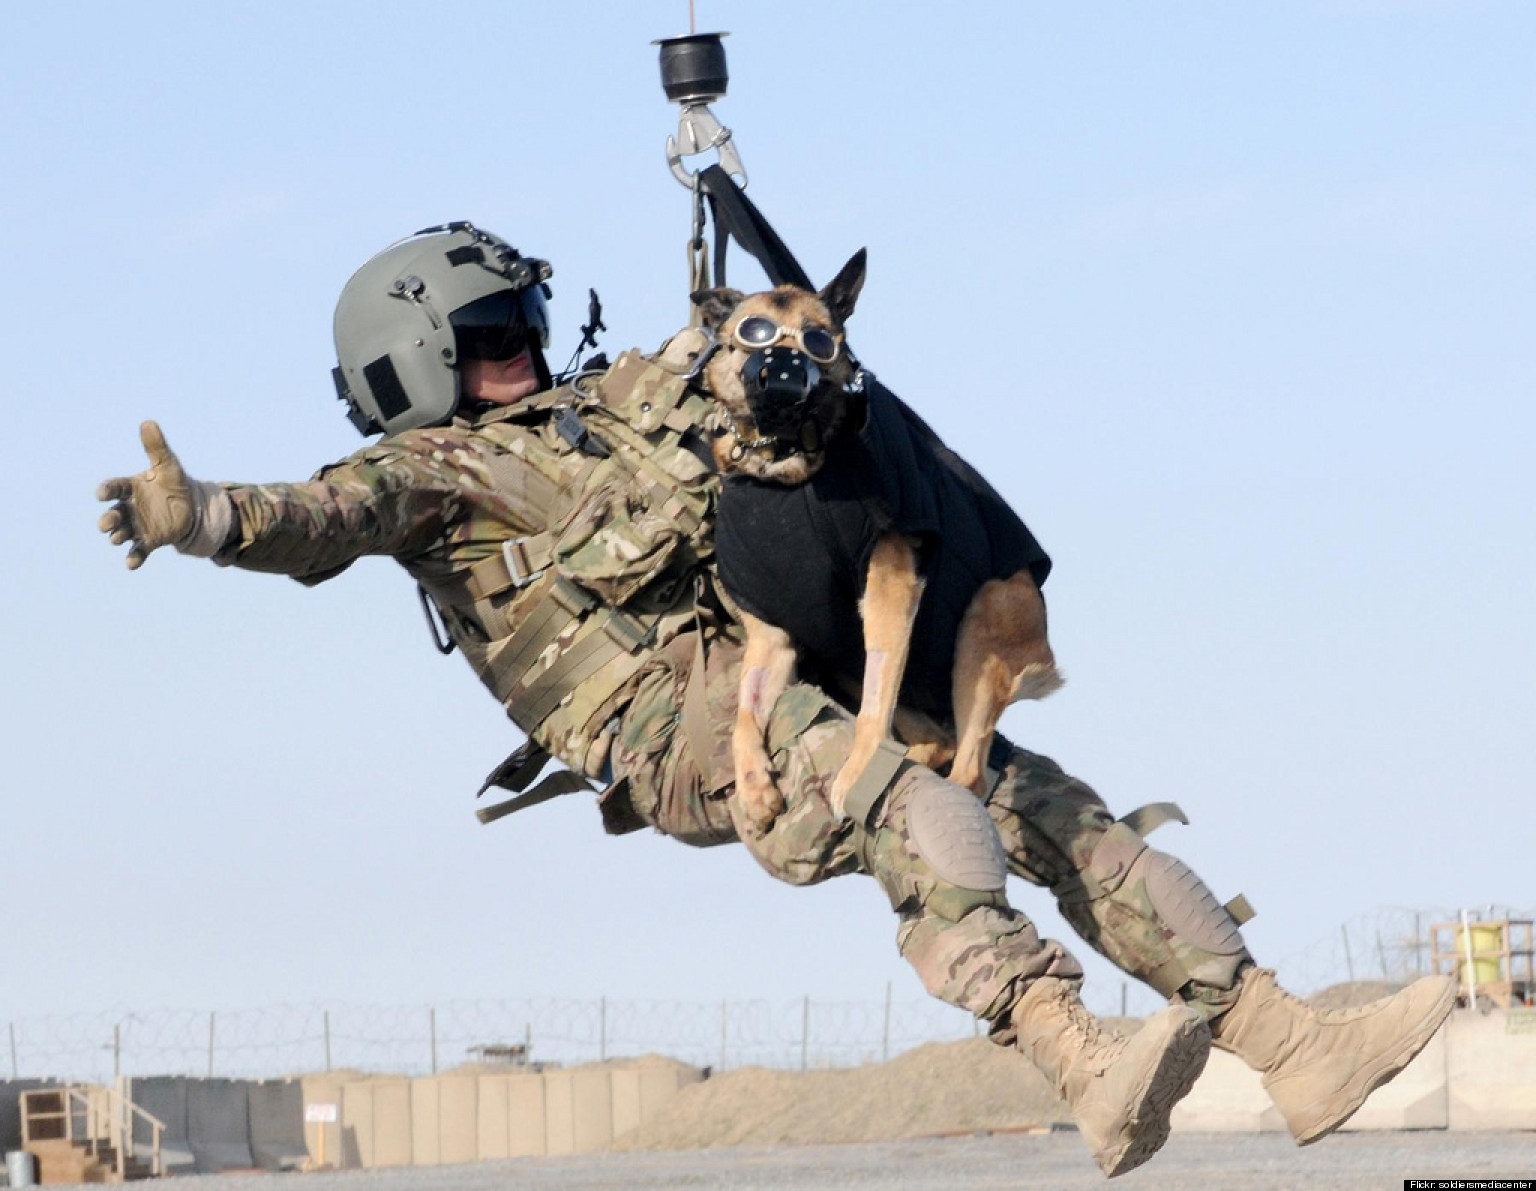 Military Working Dog Goes Airborne During Training Exercise (PHOTO)